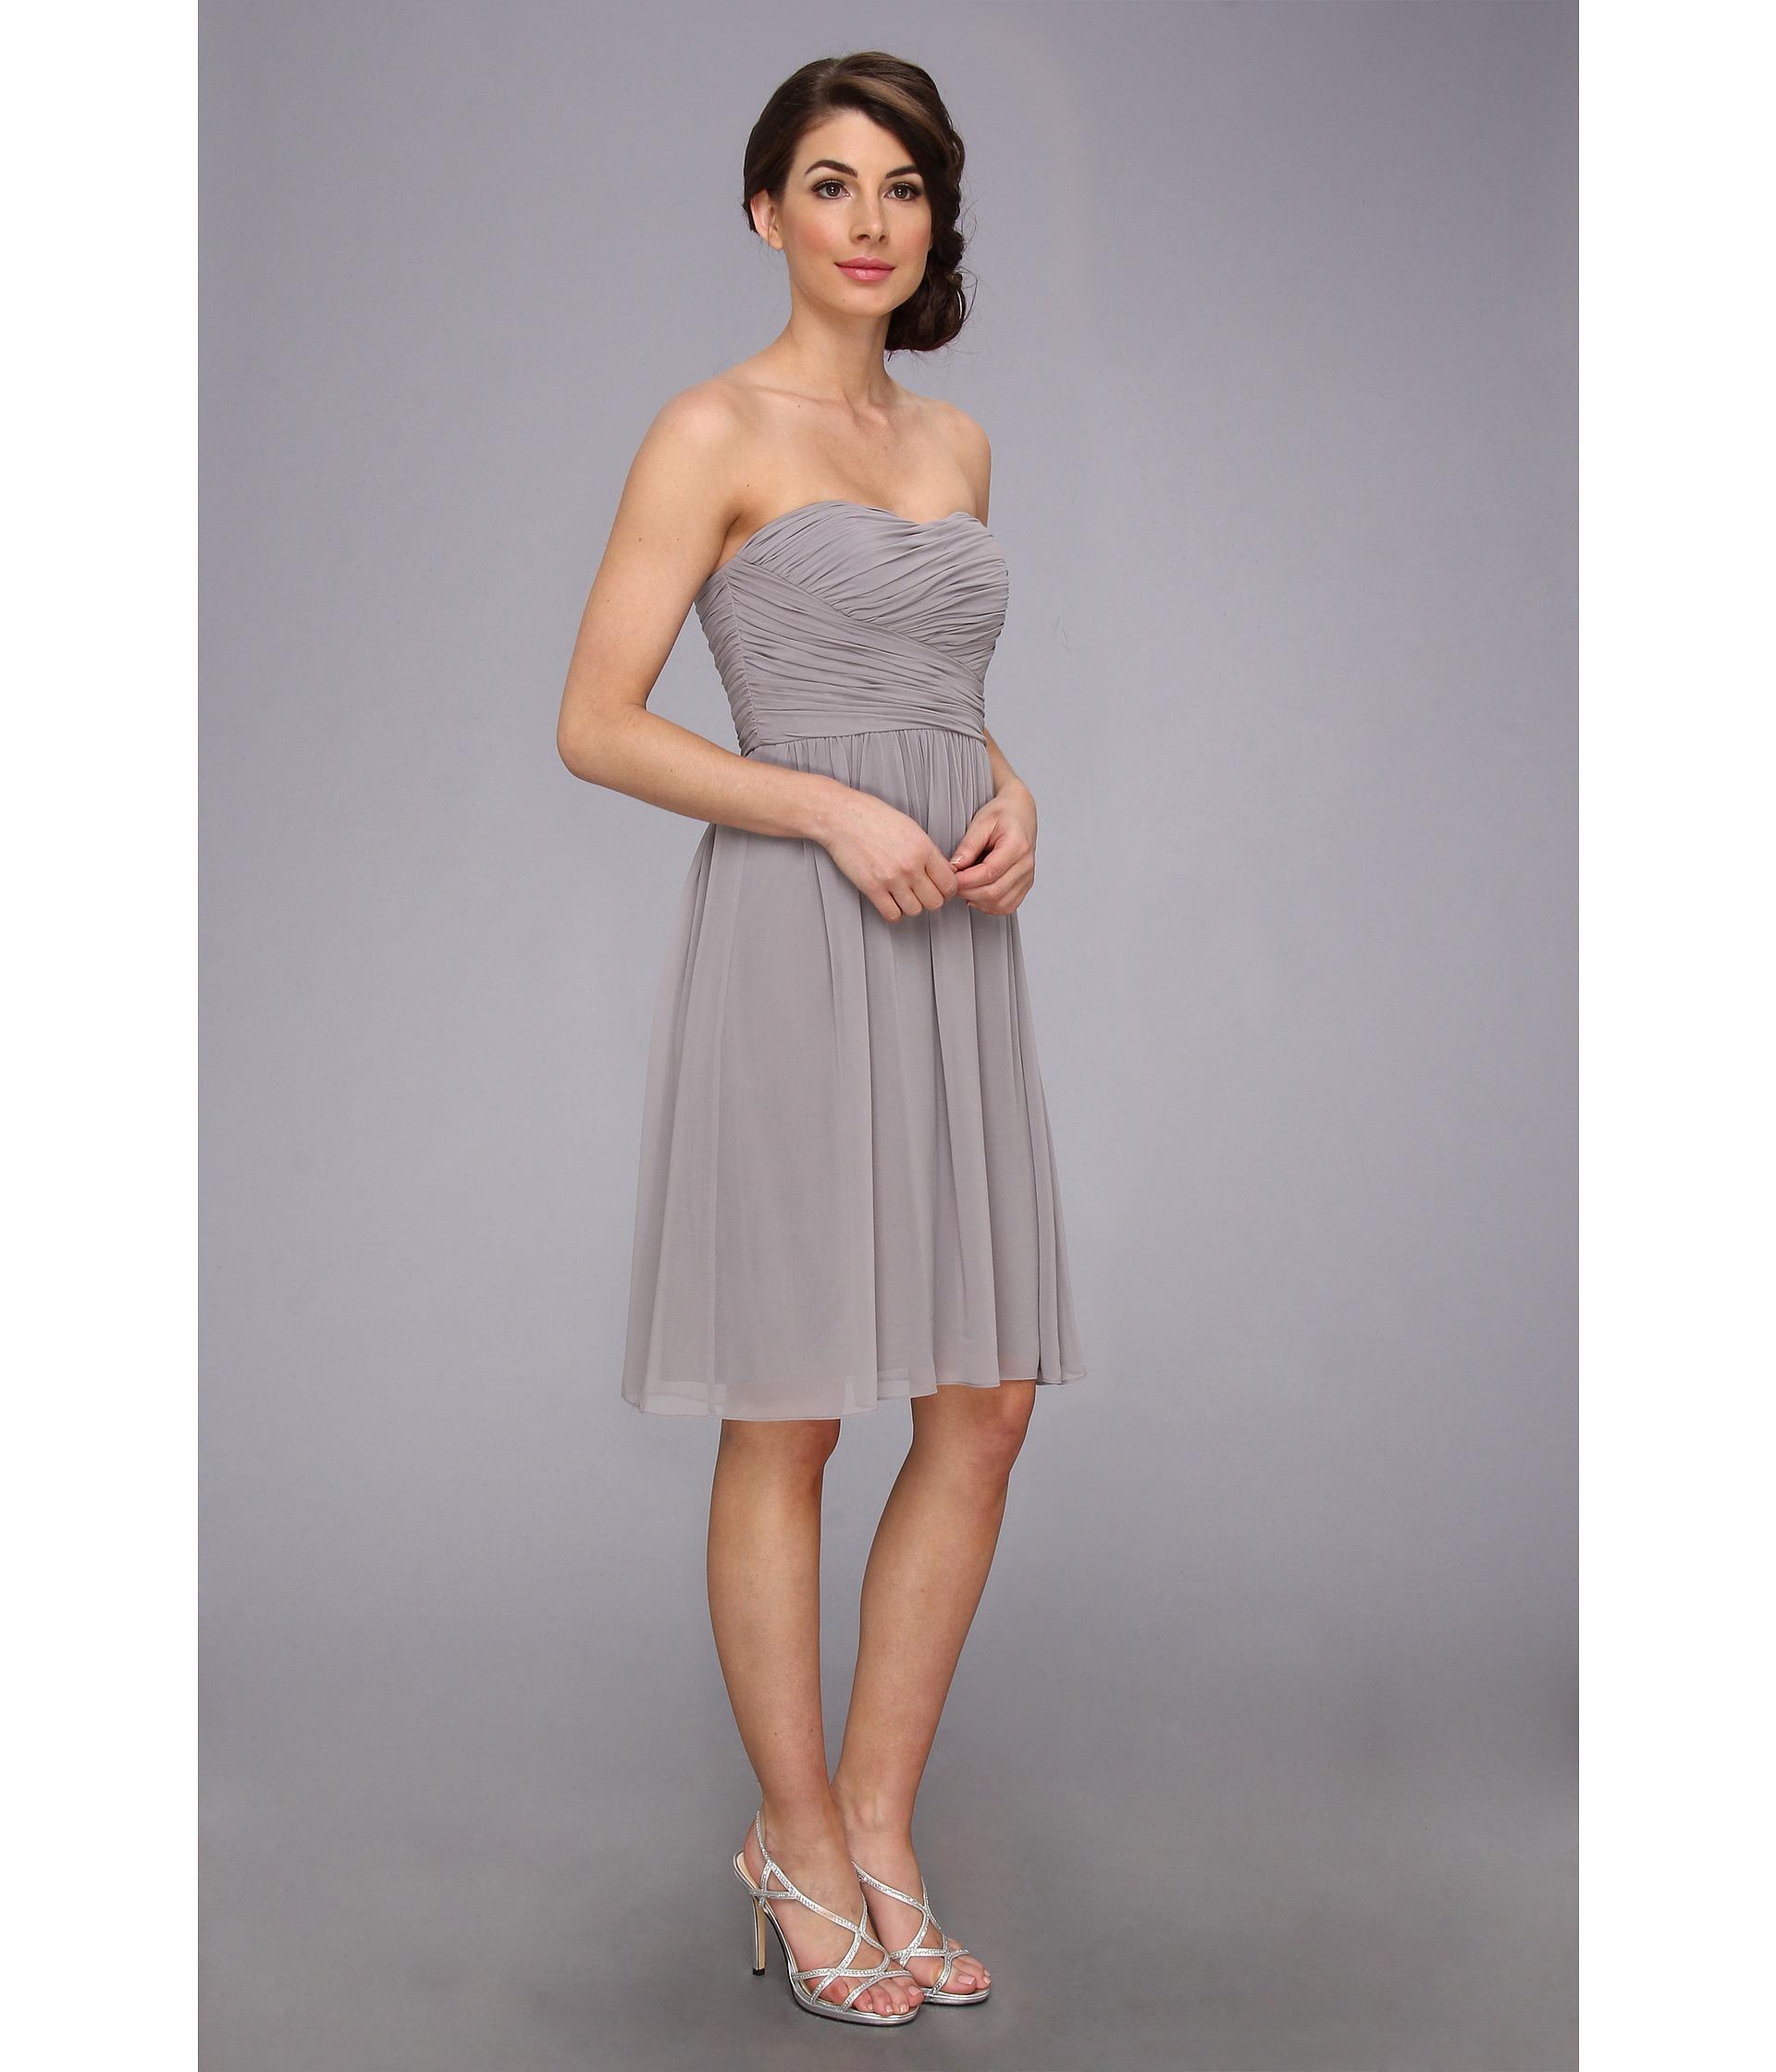 Turmec » donna morgan sarah strapless ruched chiffon dress